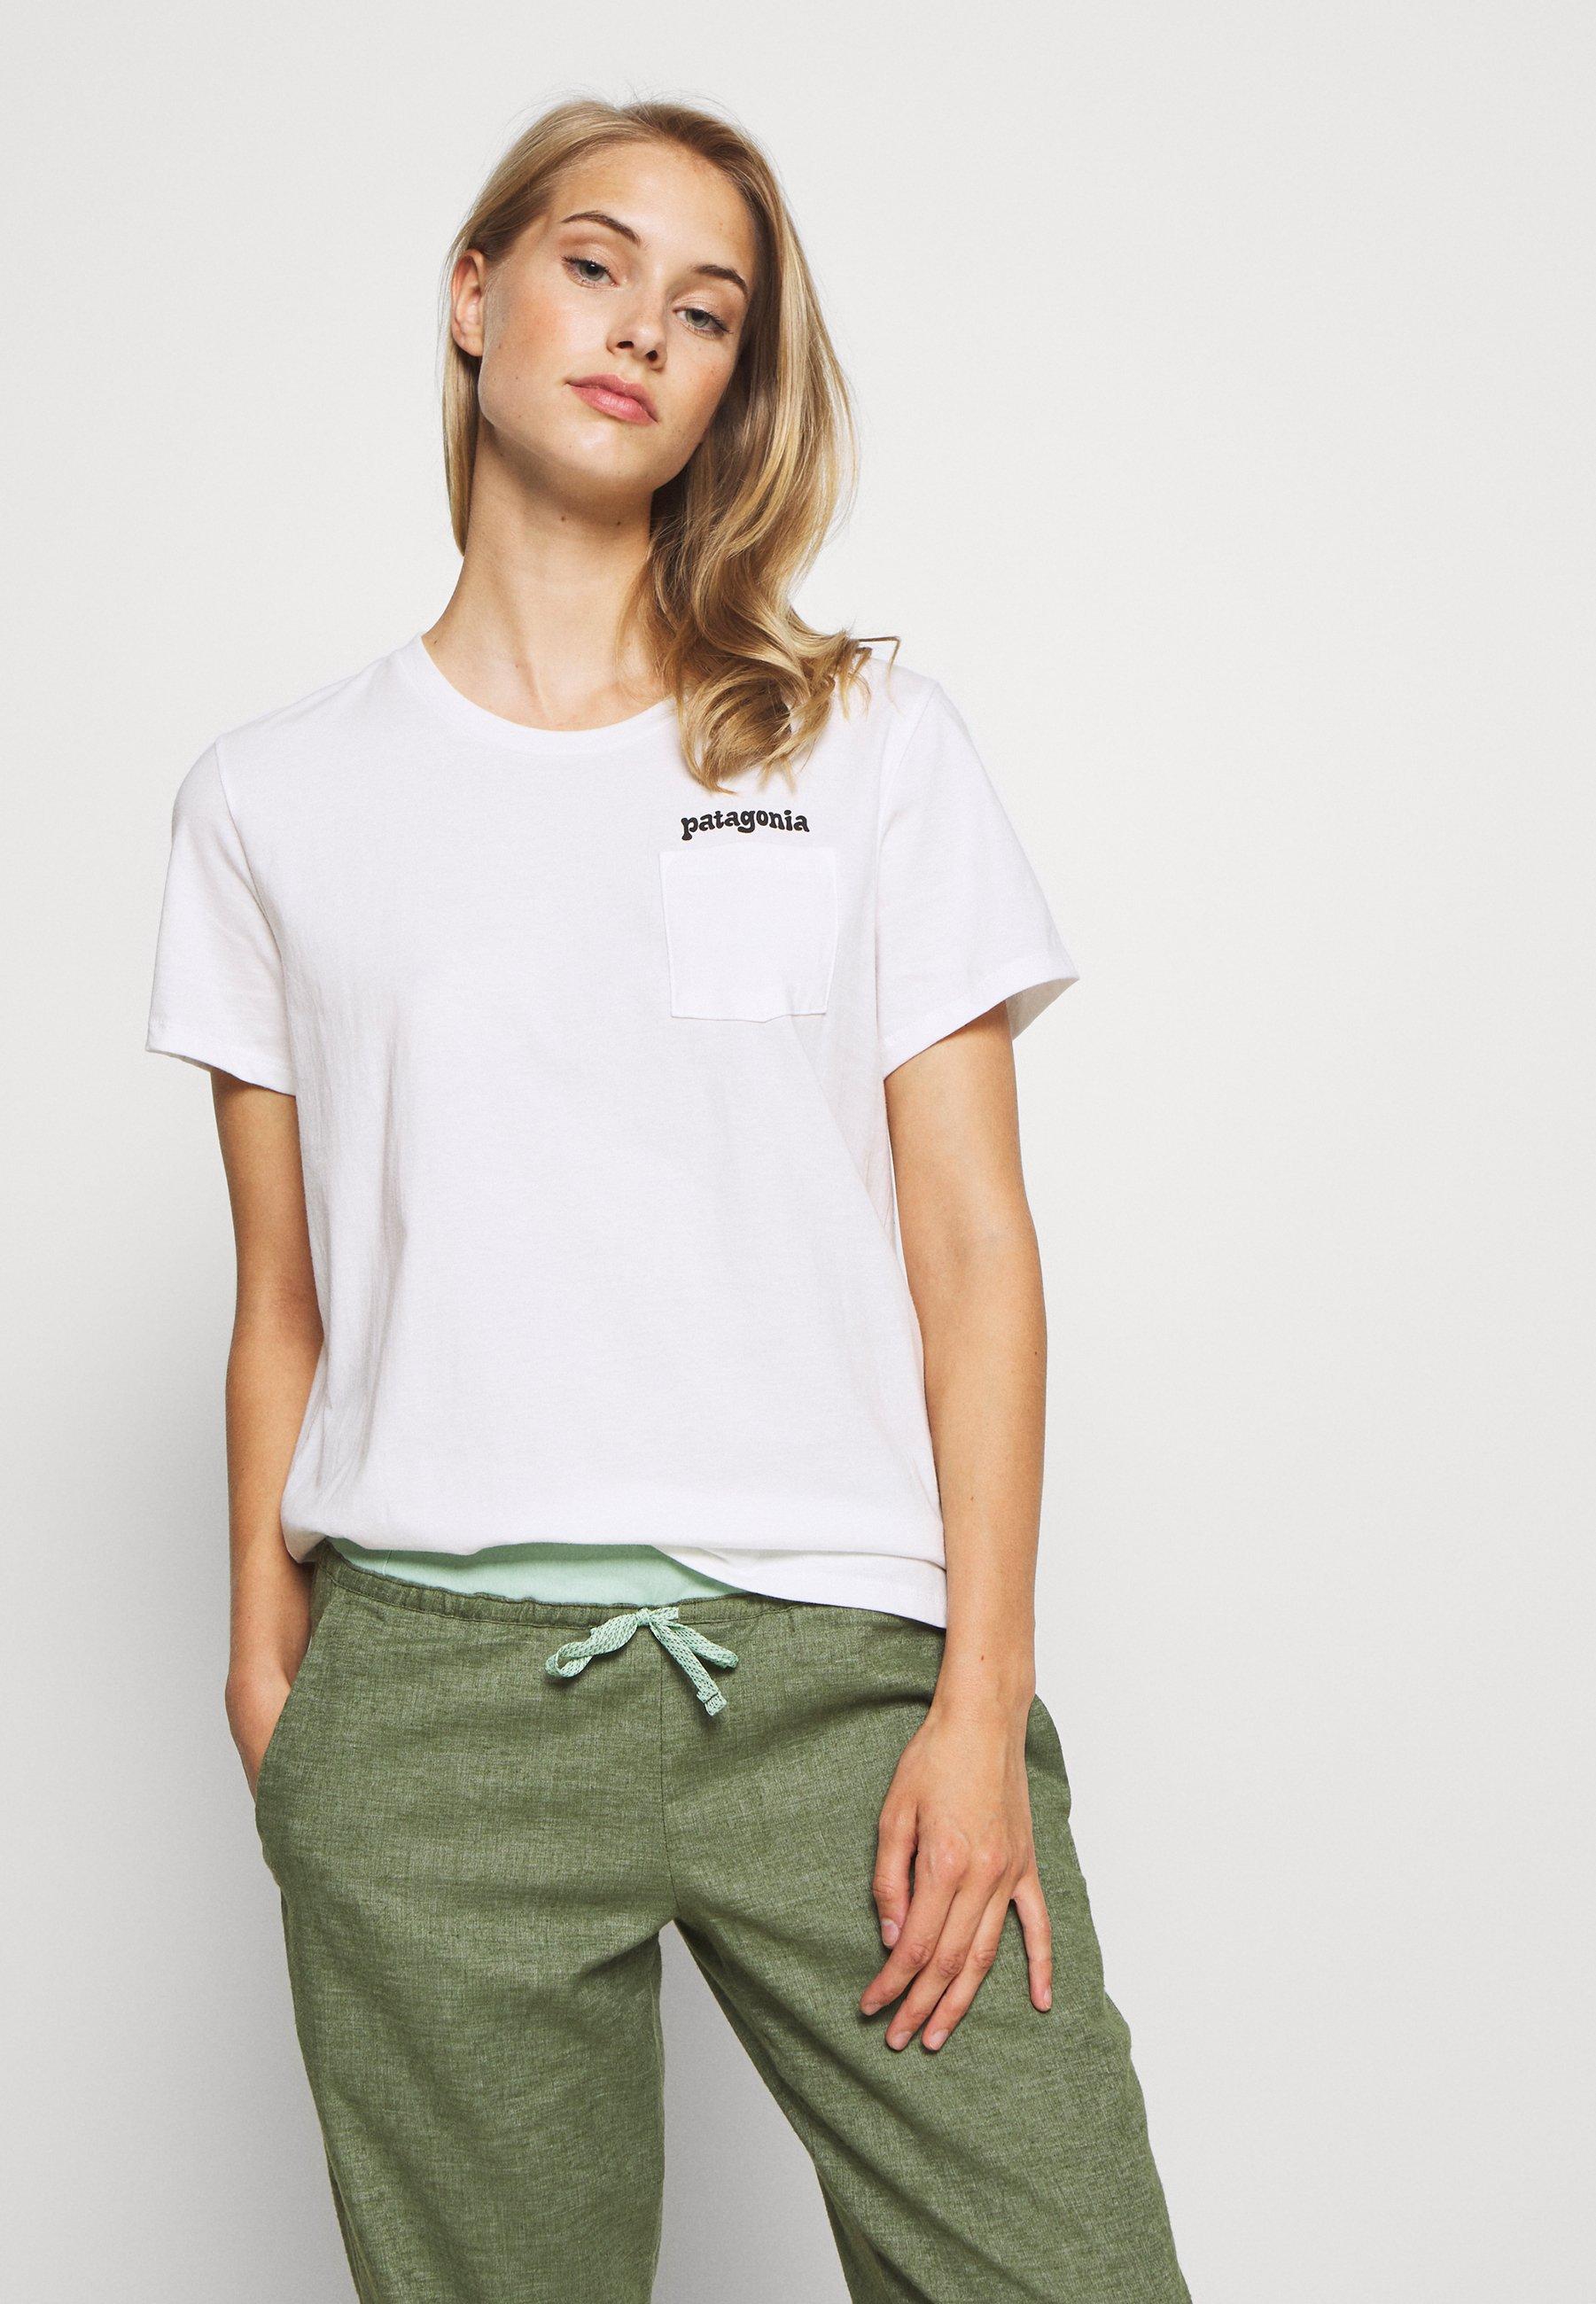 Patagonia FITZ ROY FAR OUT ORGANIC CREW POCKET T shirt